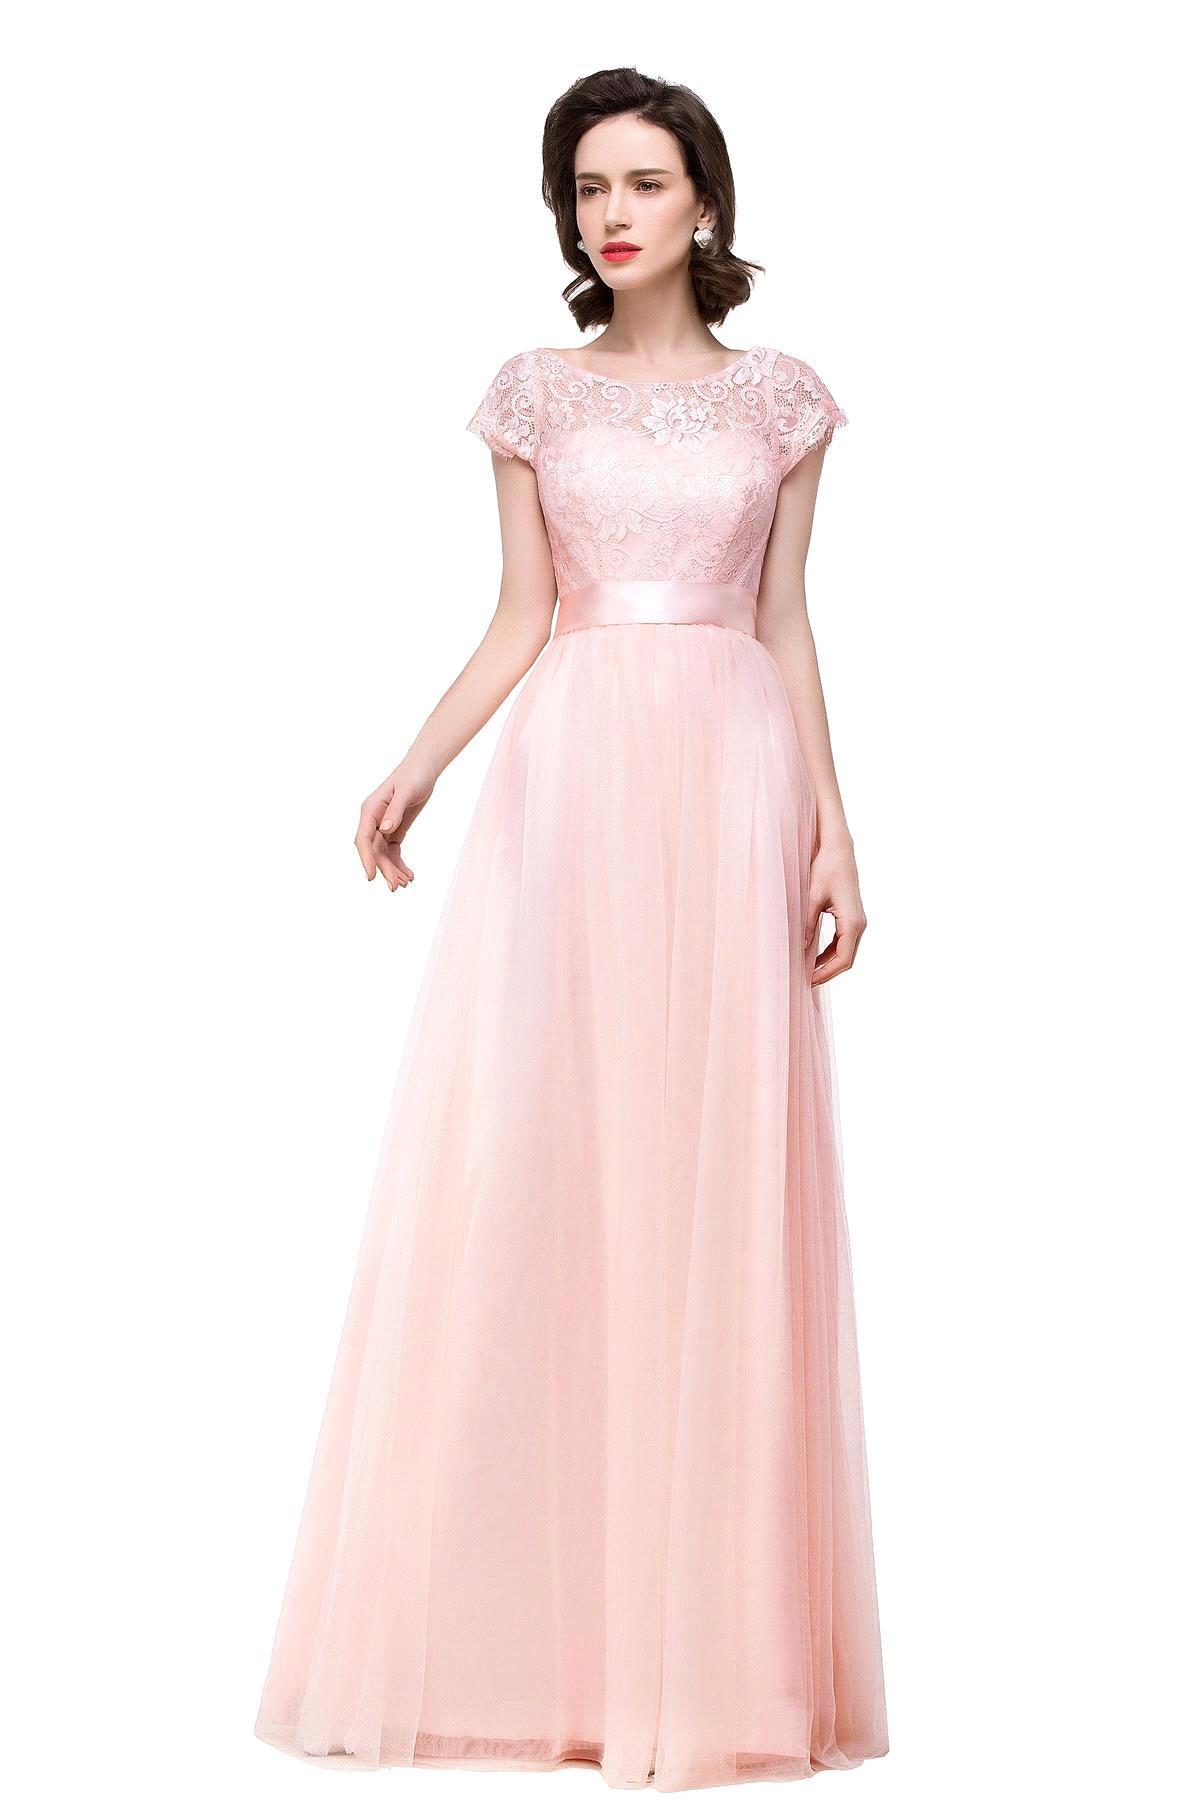 online get cheap blush pink bridesmaid dress aliexpress. Black Bedroom Furniture Sets. Home Design Ideas